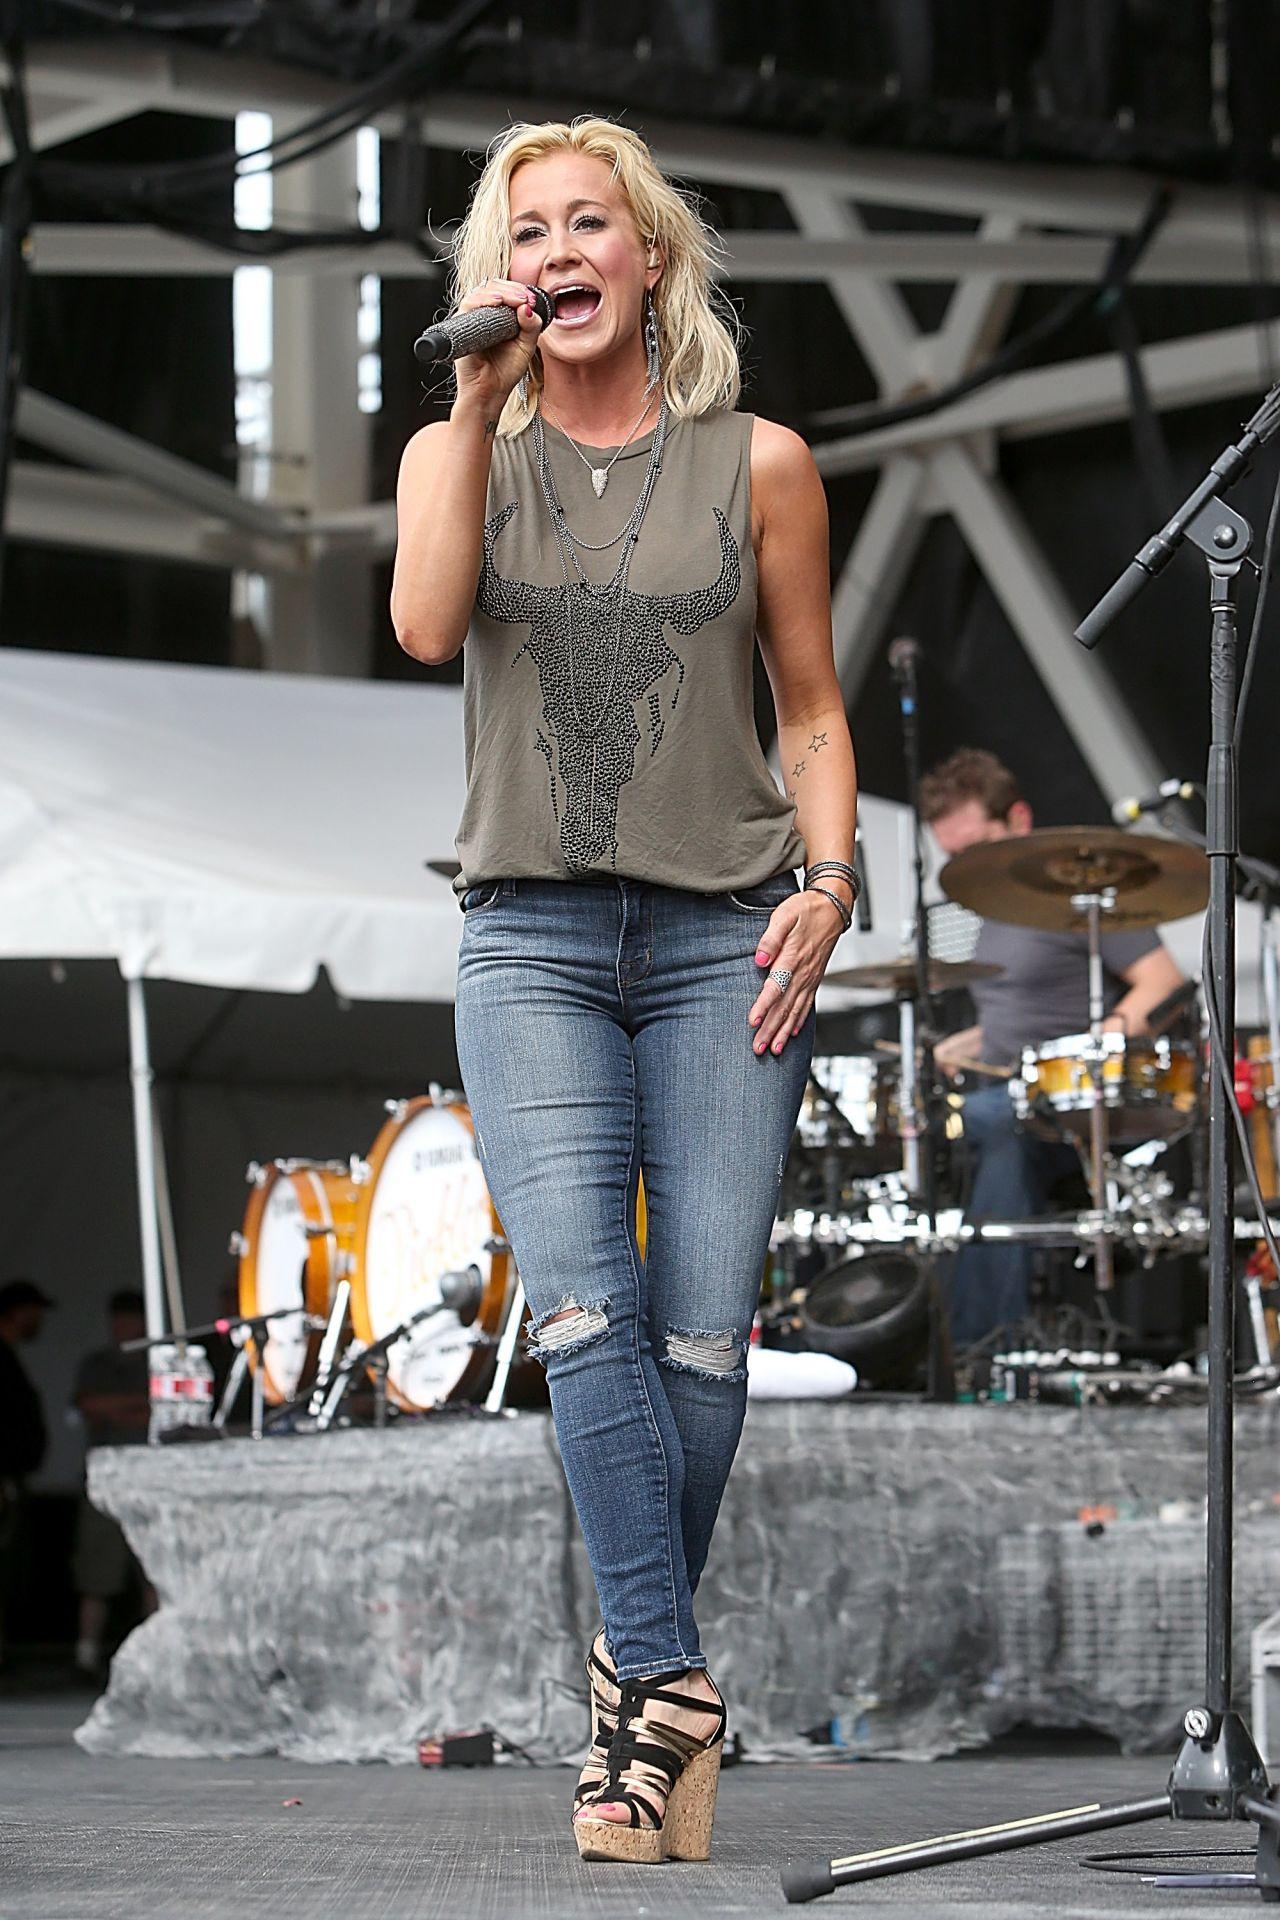 Kellie Pickler In Jeans Performing At The 2014 Redfest